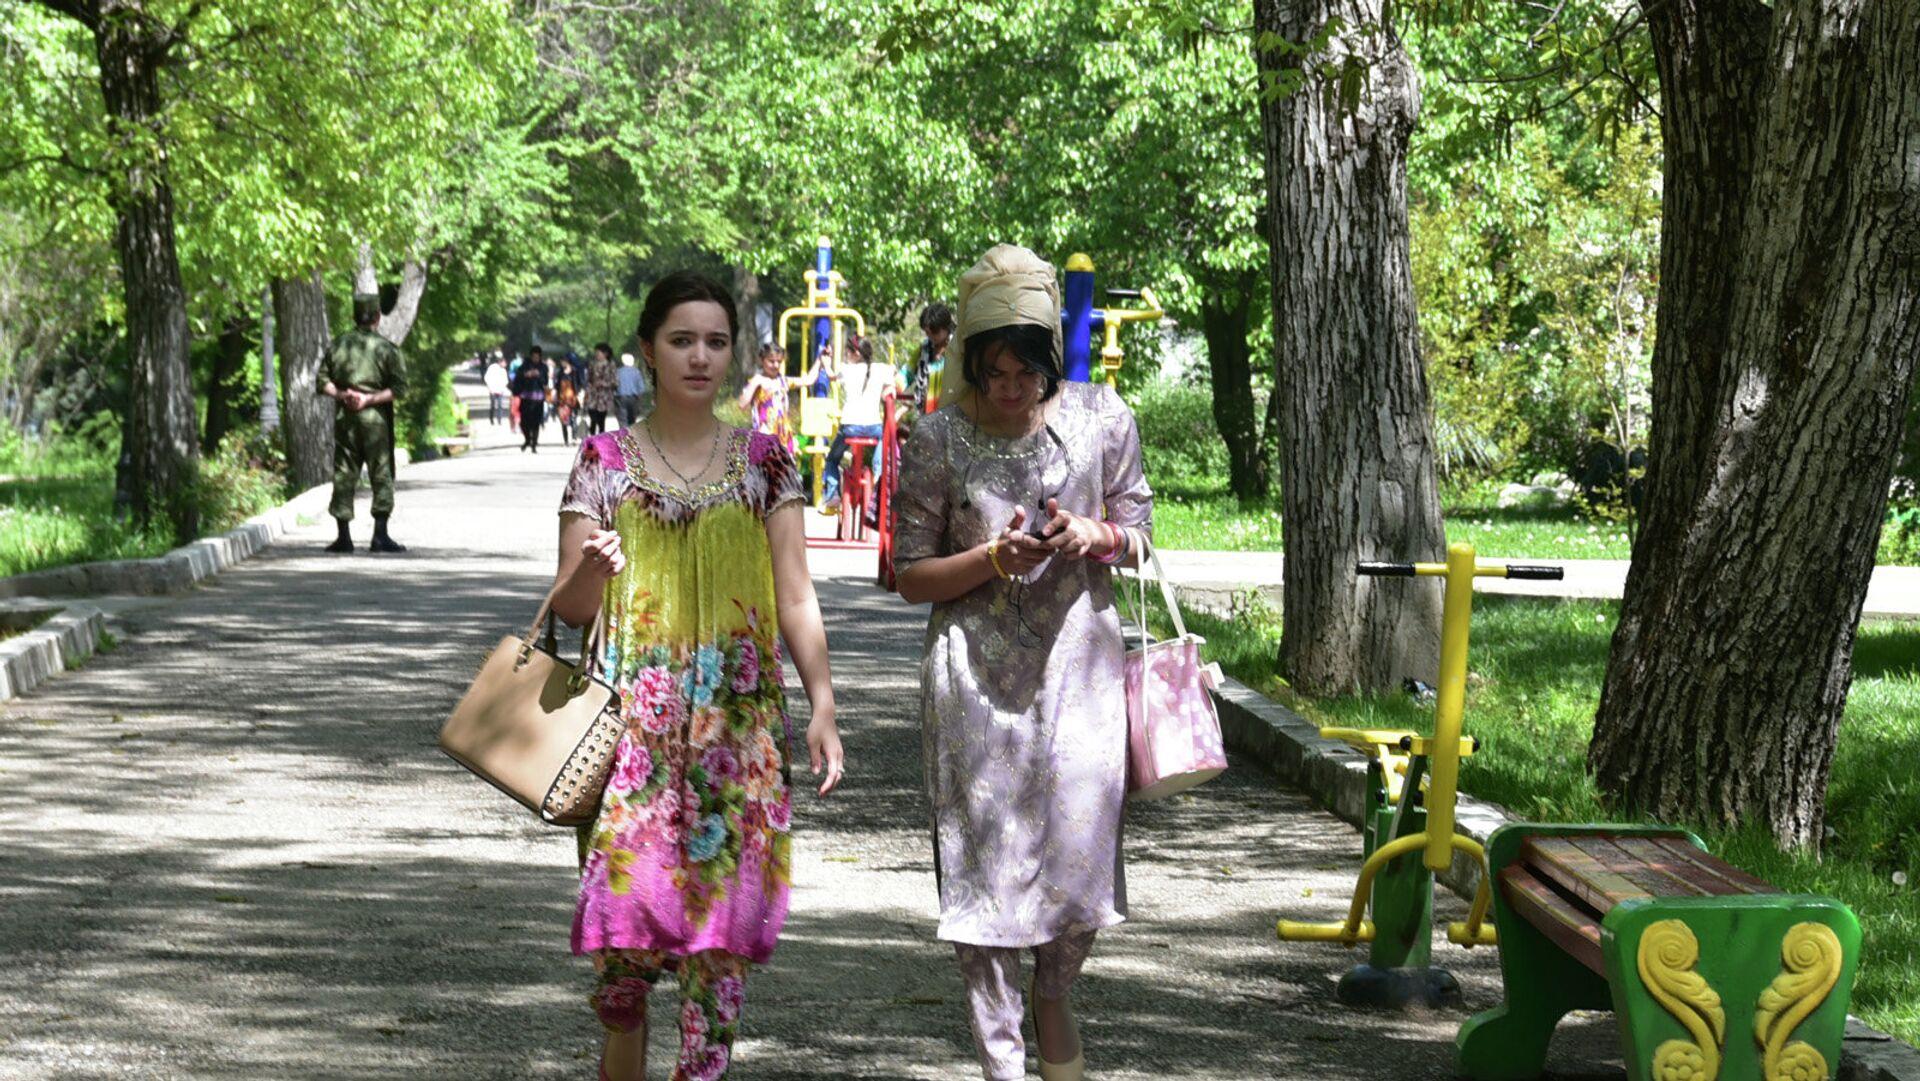 Ботанический сад Академии наук Таджикистана (Боги Ирам) - Sputnik Таджикистан, 1920, 11.10.2021